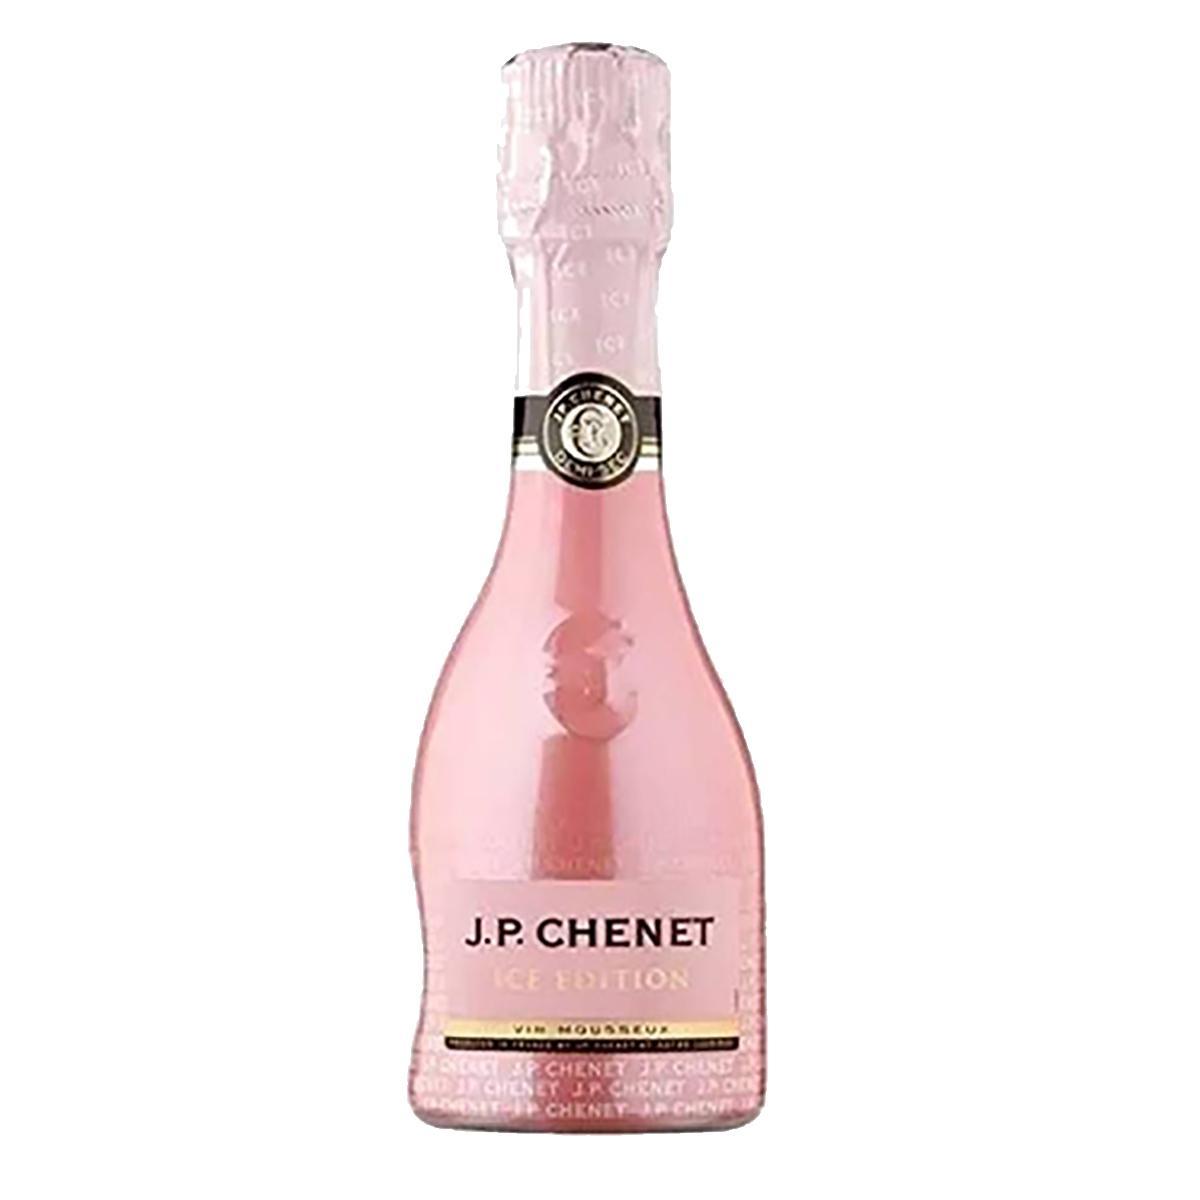 JP Chenet Ice Rosê 200ml